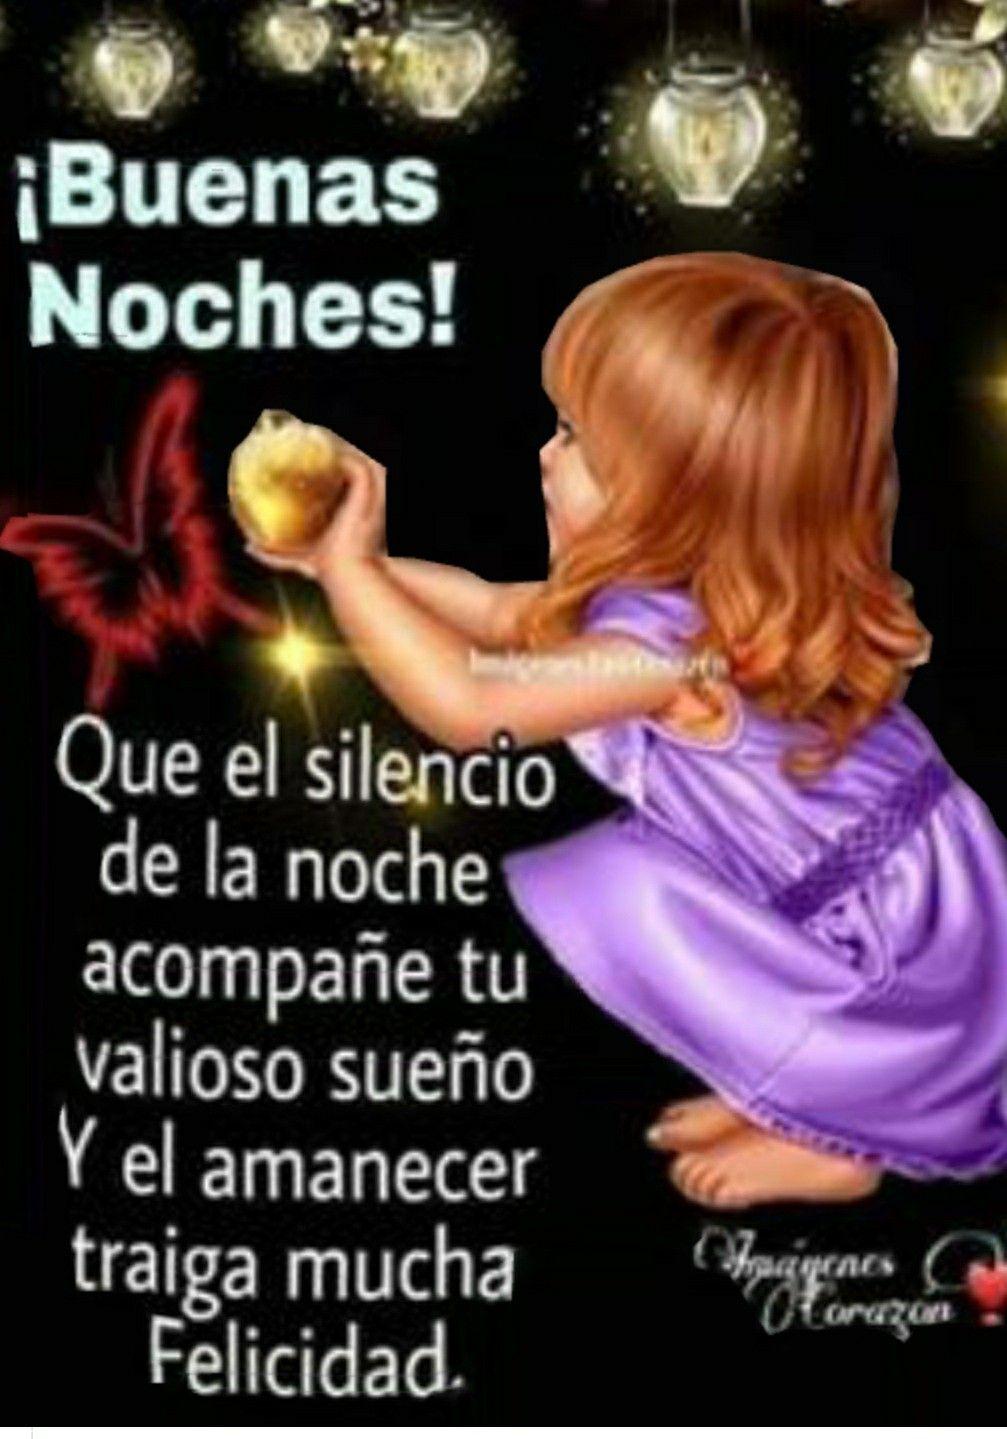 Pin De Alfredo Flores Escalante En Buenas Noches Buenas Noches Memes Divertidos Noche